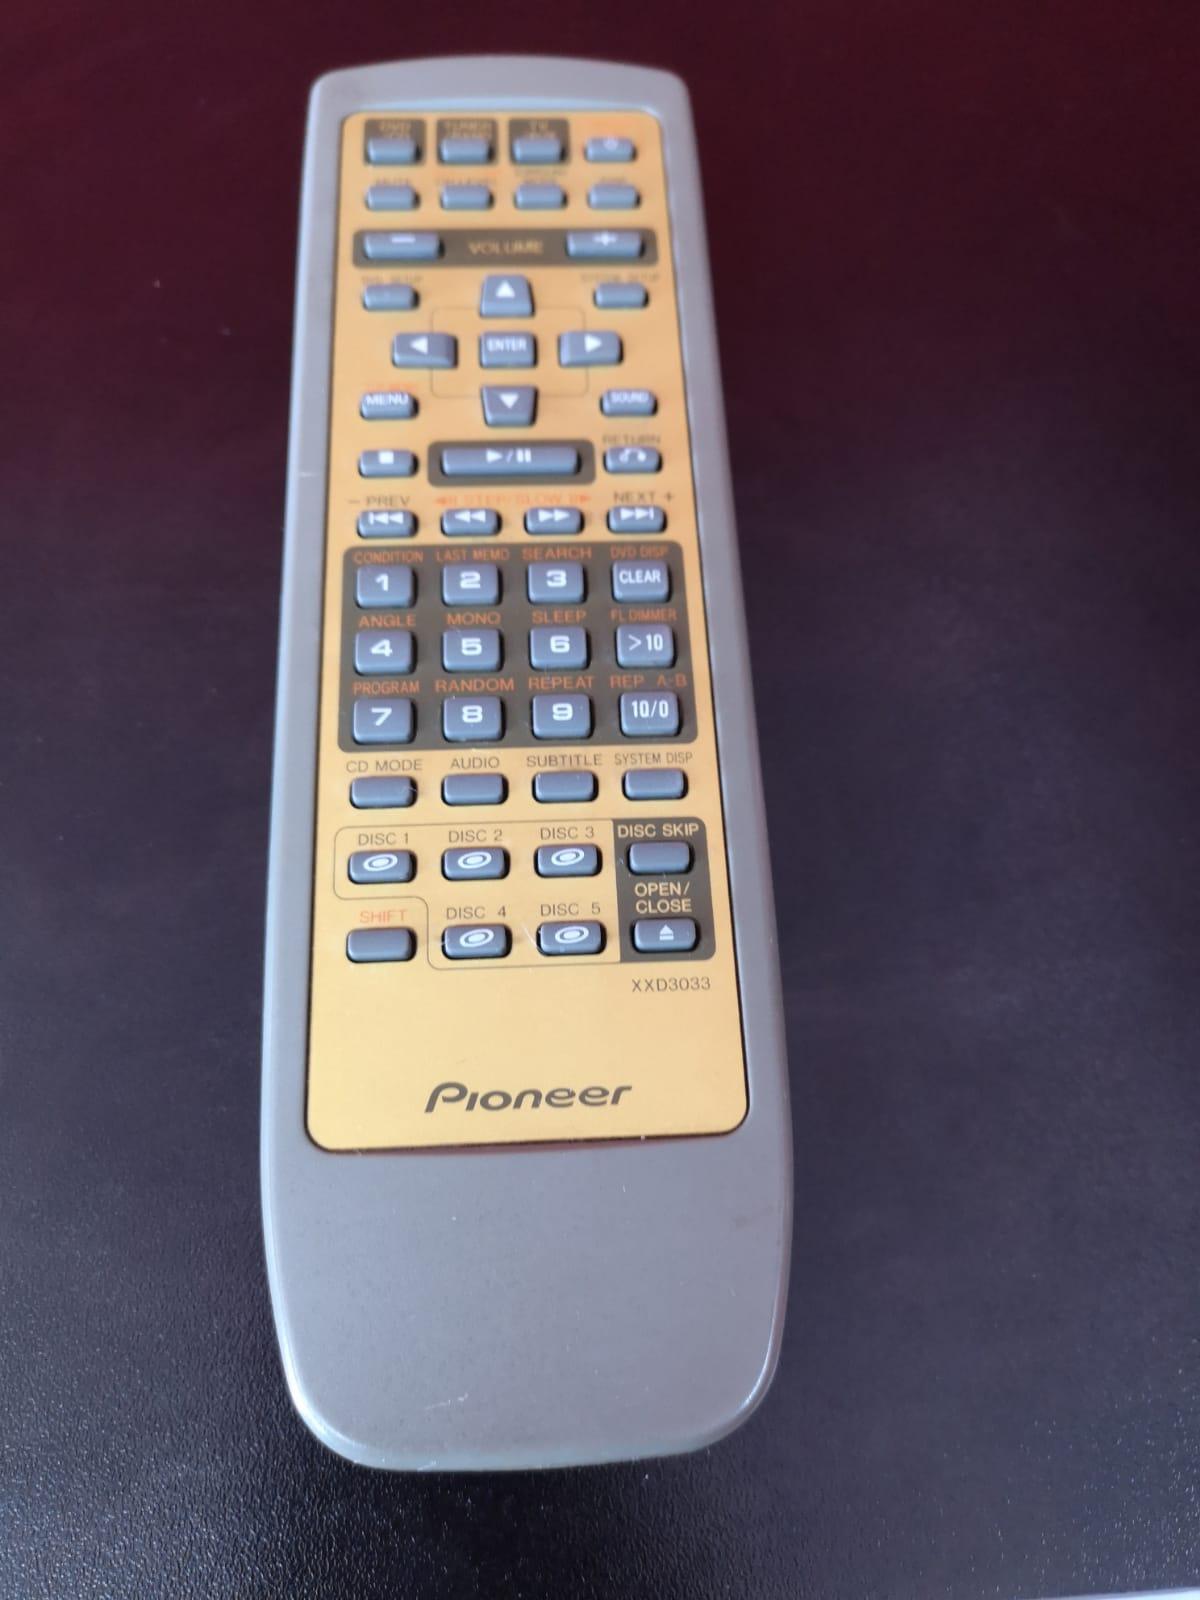 Pioneer XXD3033 Remote